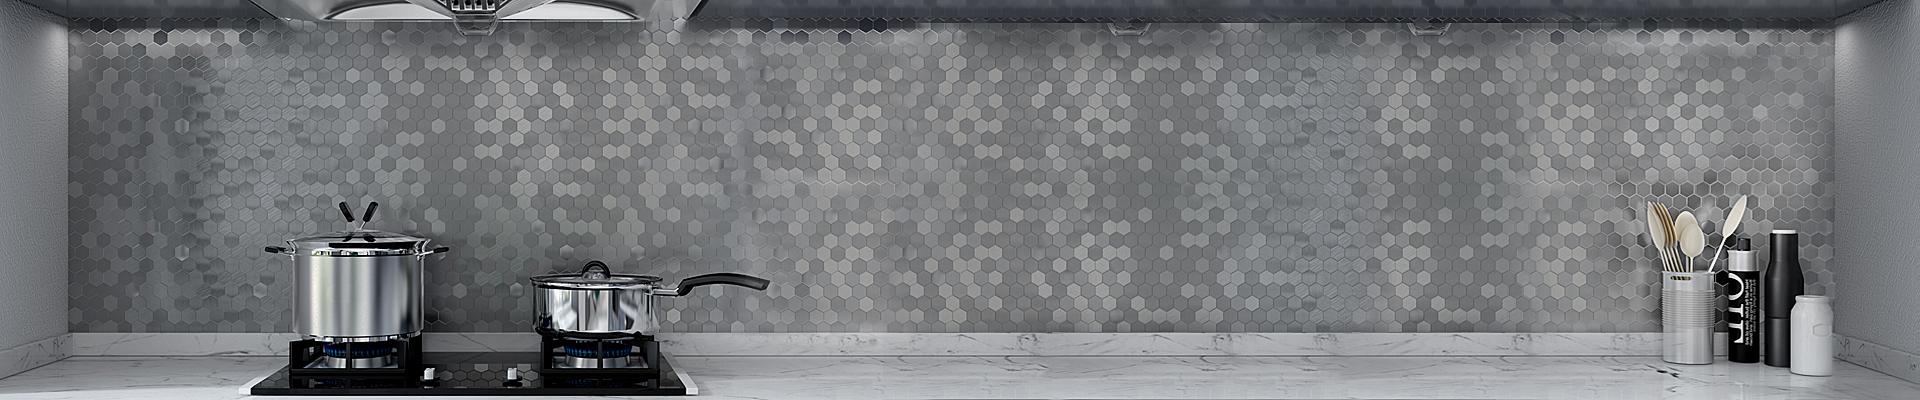 video-home preminum aluminum mosaic tile customized for restuarant-Heng Xing-img